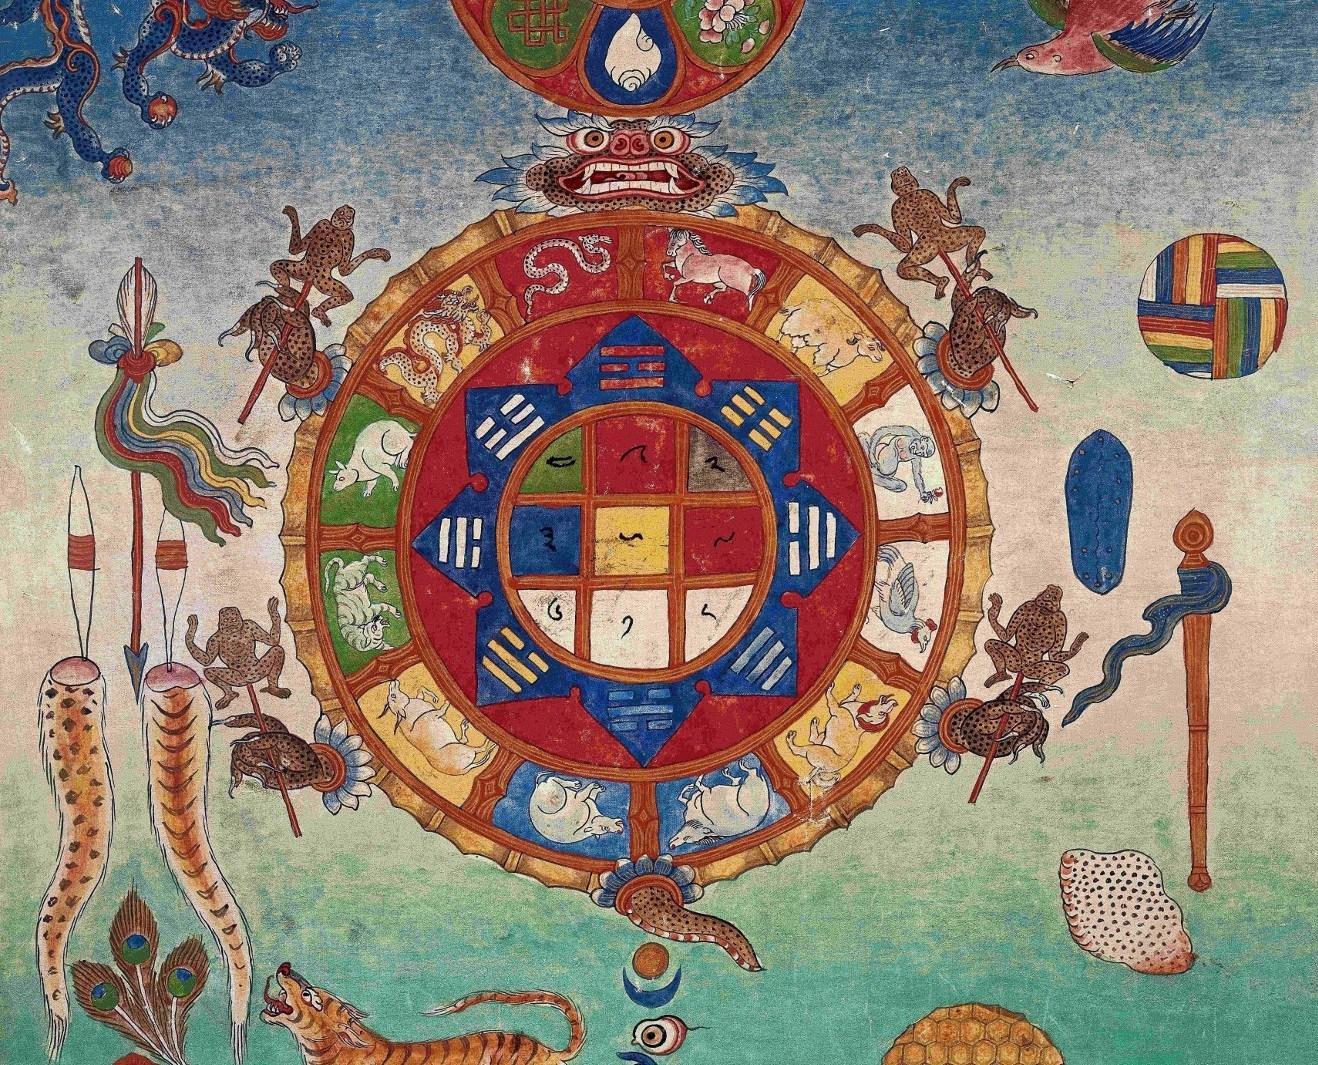 L'astrologie chinoise et les signes chinois